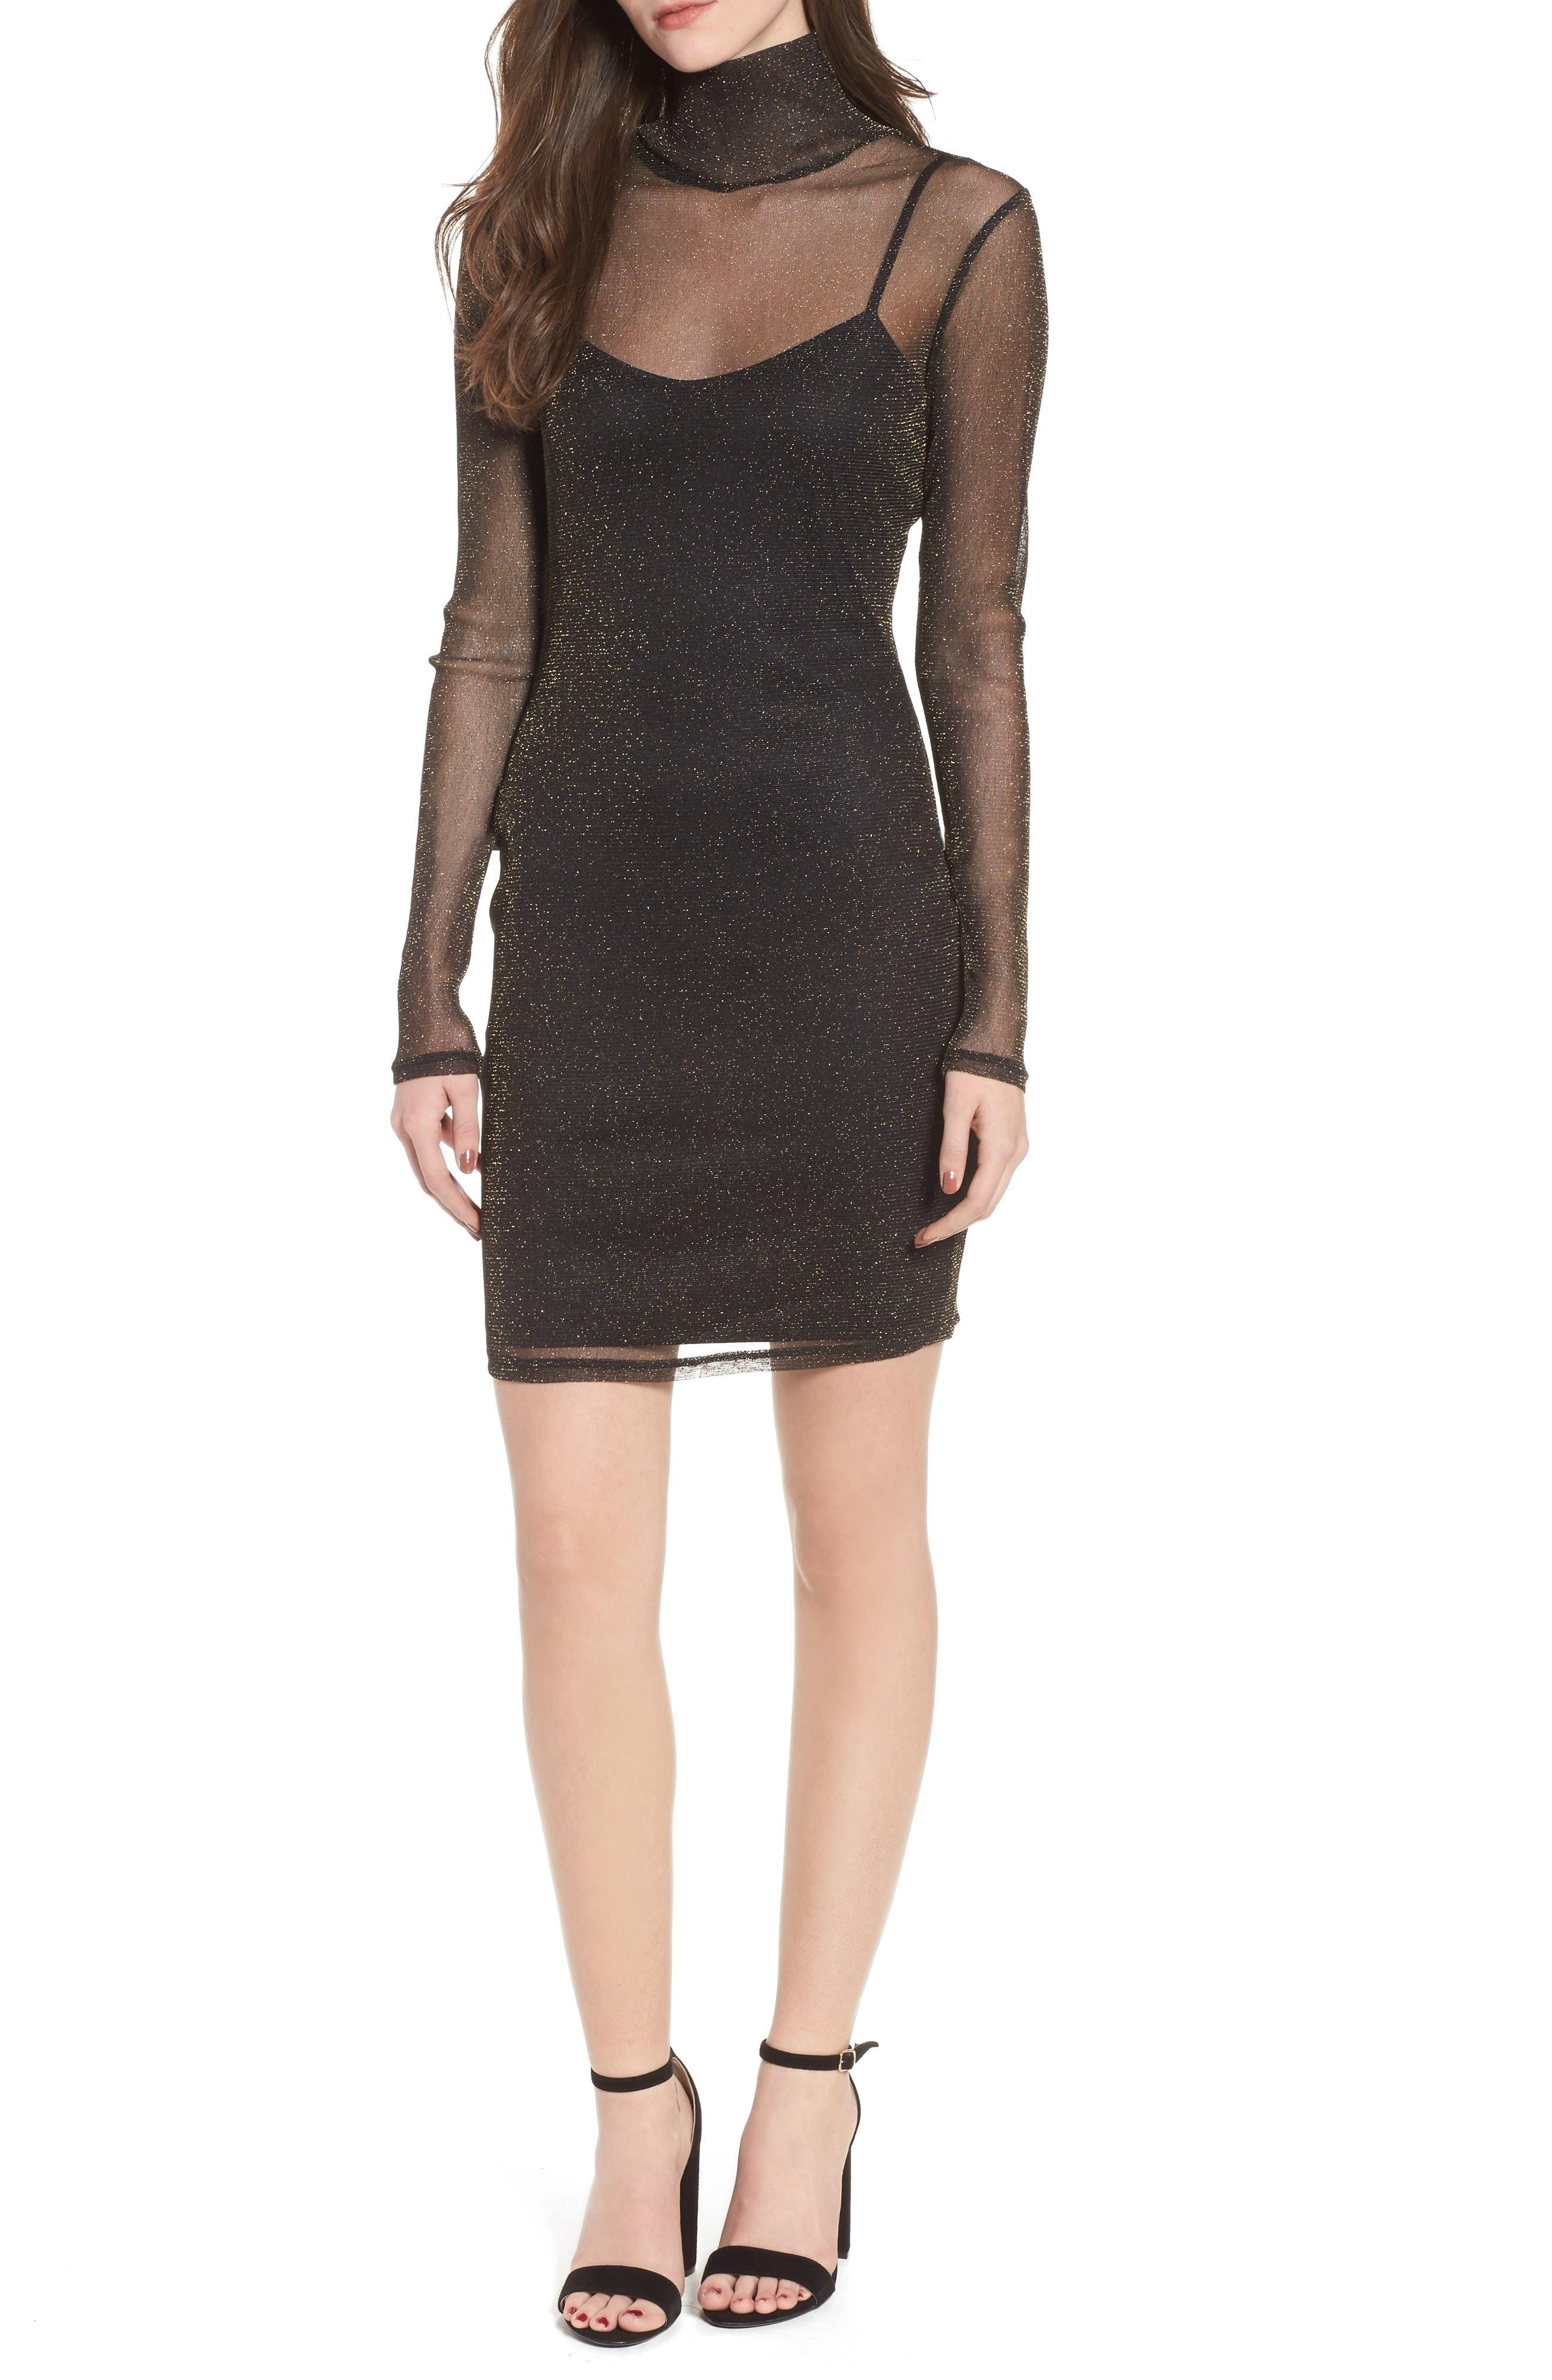 Main Image - Love, Fire Metallic Mesh Body-Con Dress